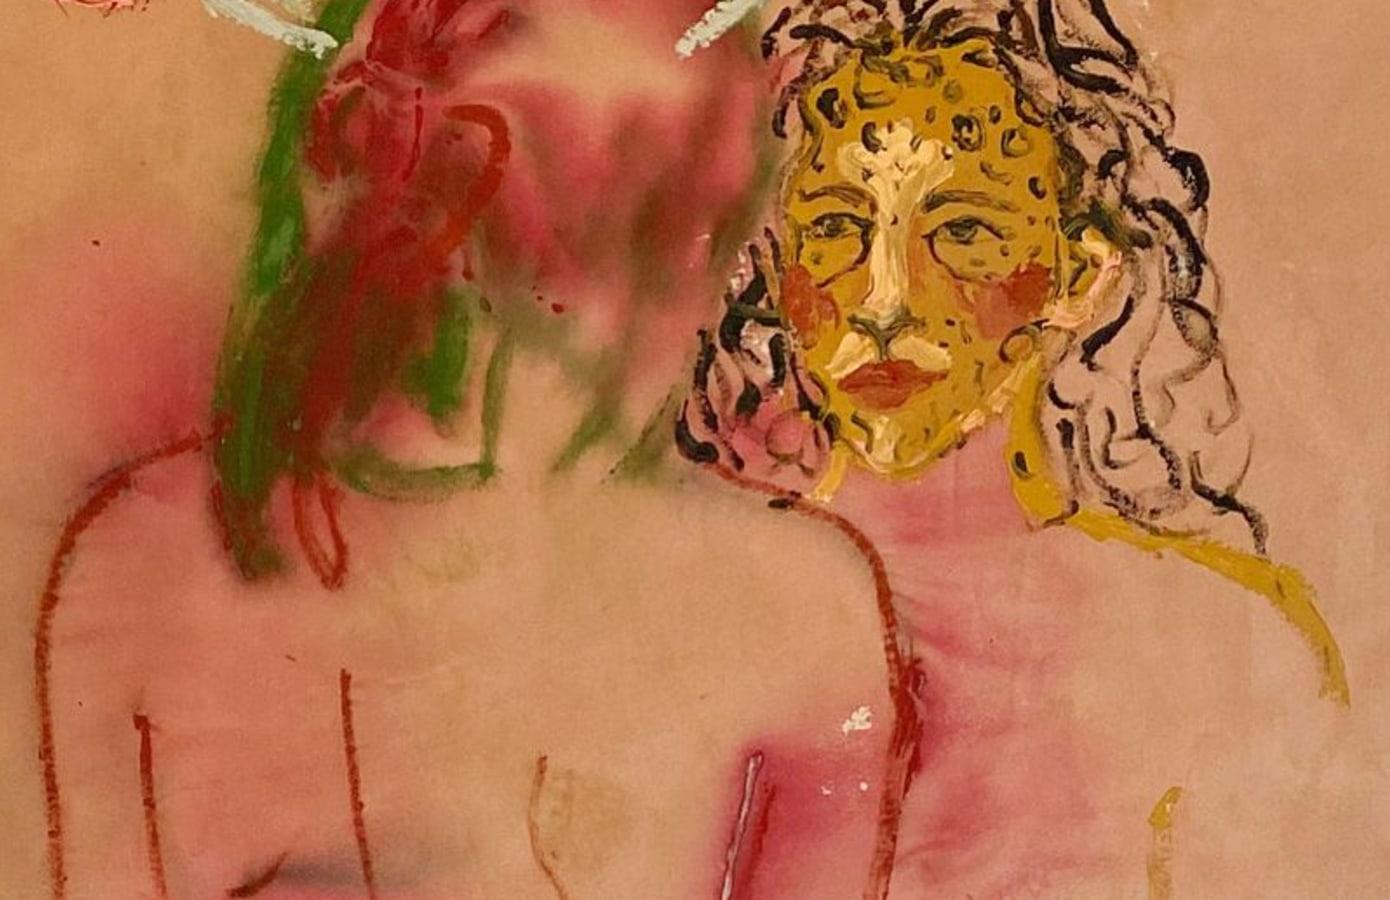 Bad Habits, Good intentions, Katarina Janeckova Walshe,